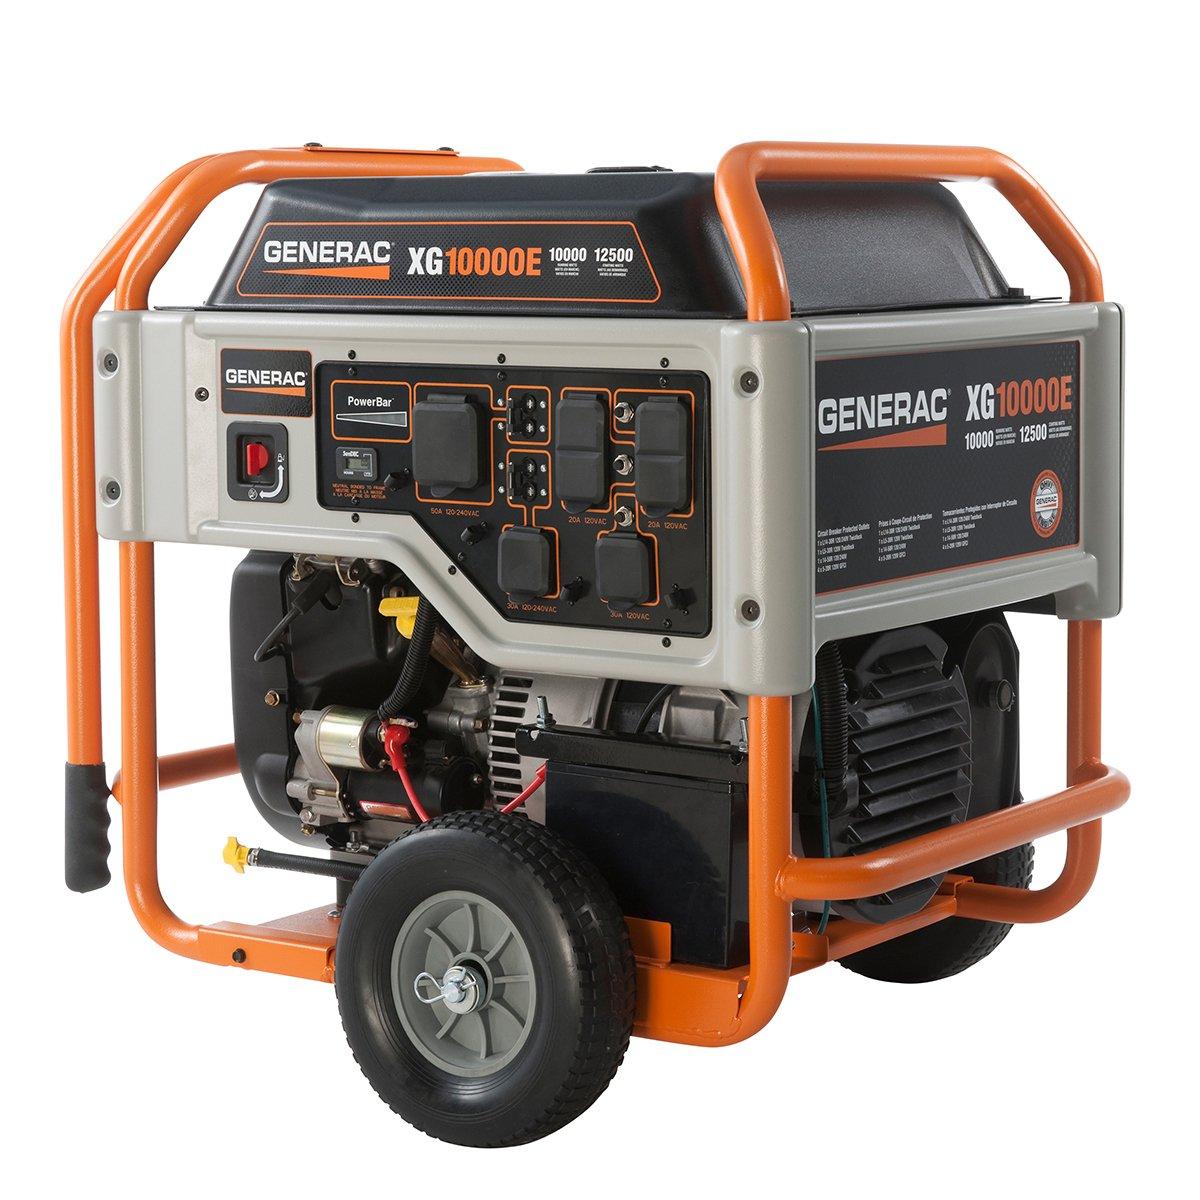 Amazon.com : Generac 5802, 10000 Running Watts/12500 Starting Watts, Gas  Powered Portable Generator : Garden & Outdoor